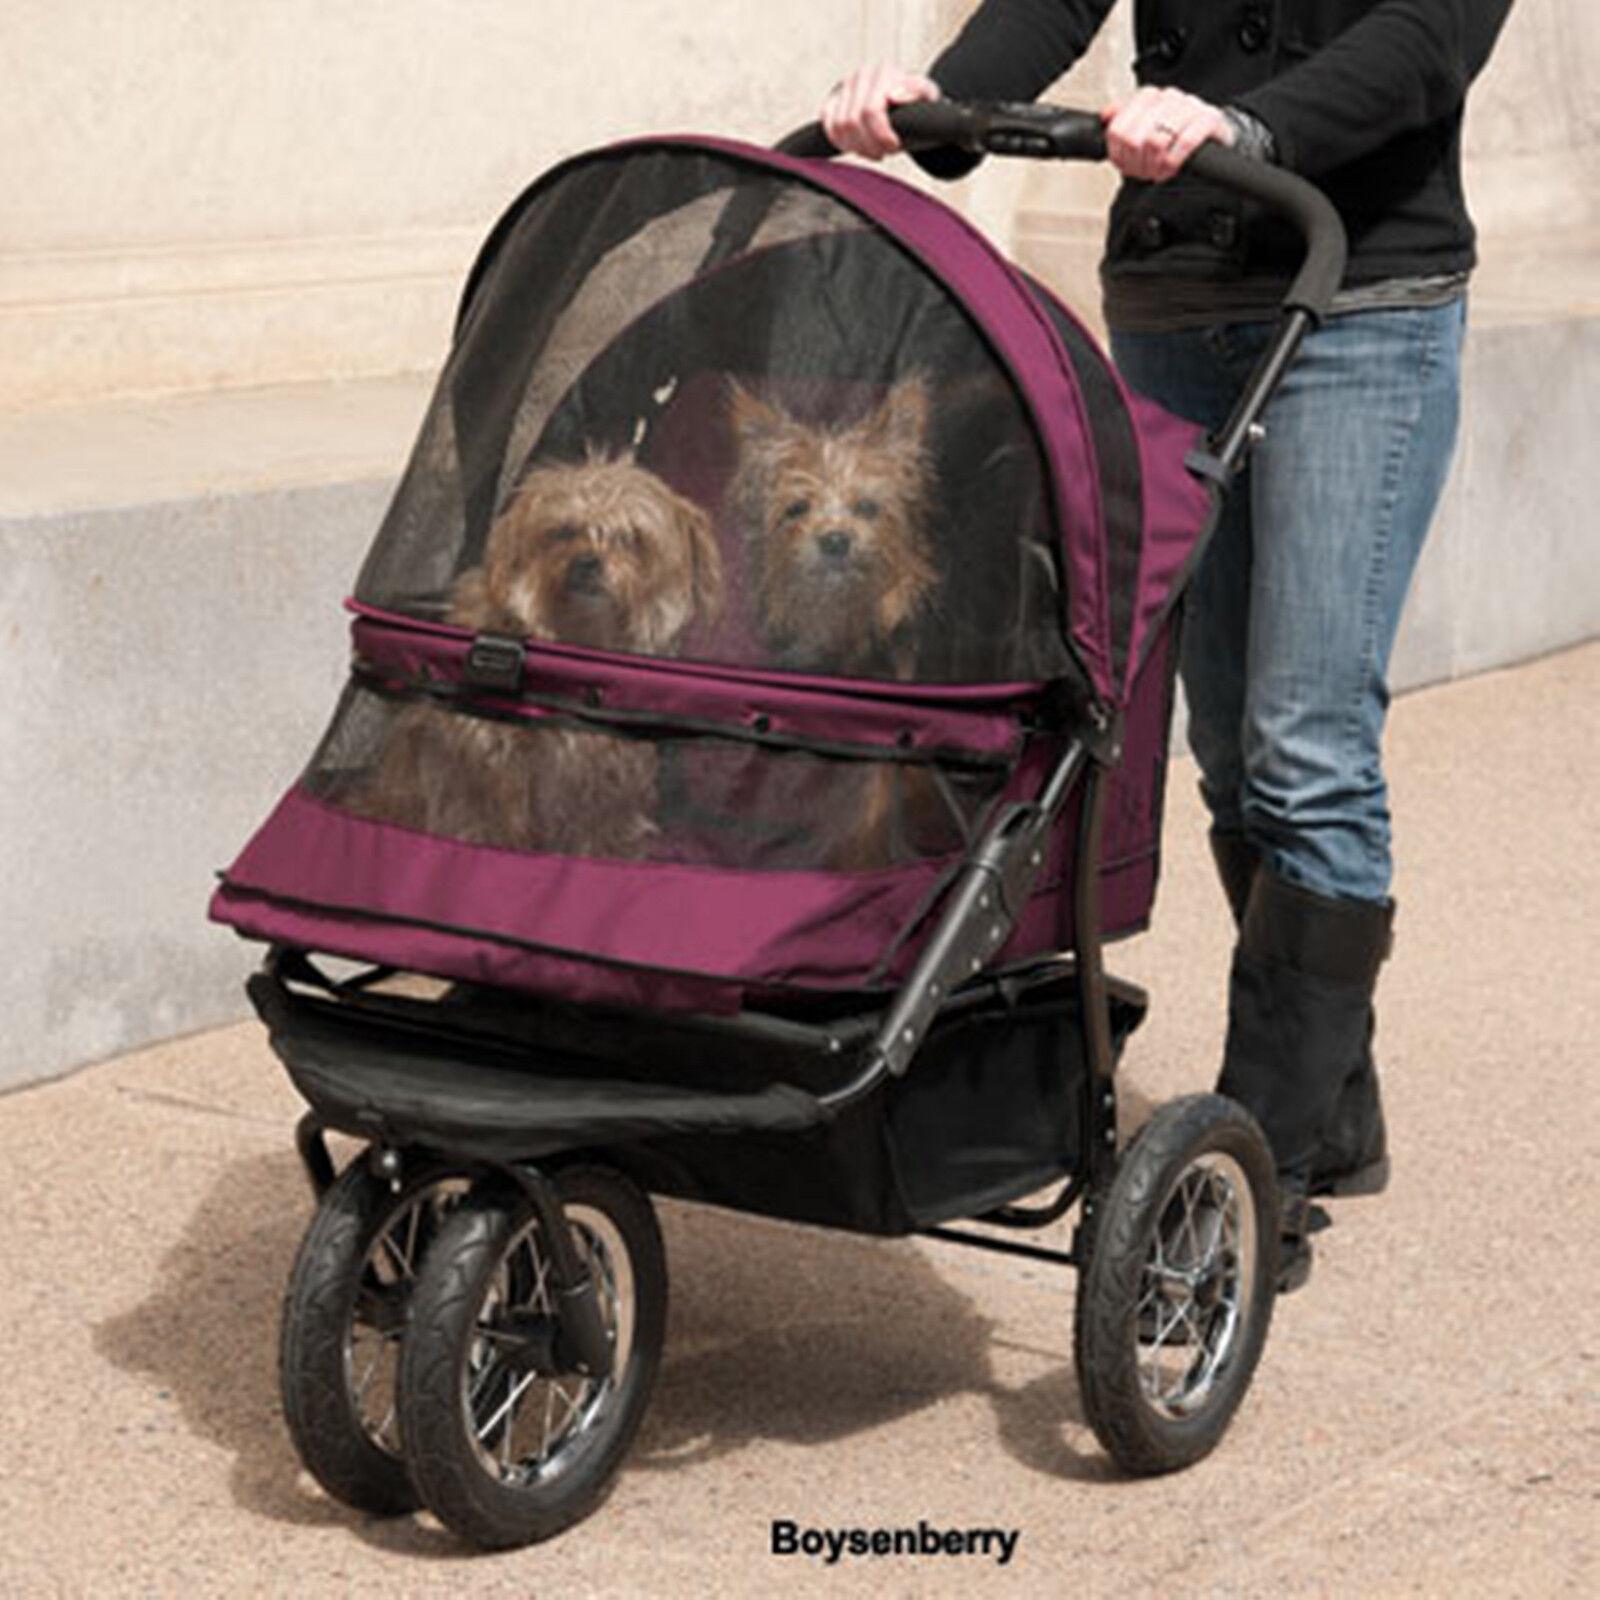 benvenuto a comprare Double Pet Stroller Pet Gear No-Zip Boysenberry Boysenberry Boysenberry 90 lbs 4-5 small 2 med PG8700NZB  acquisti online